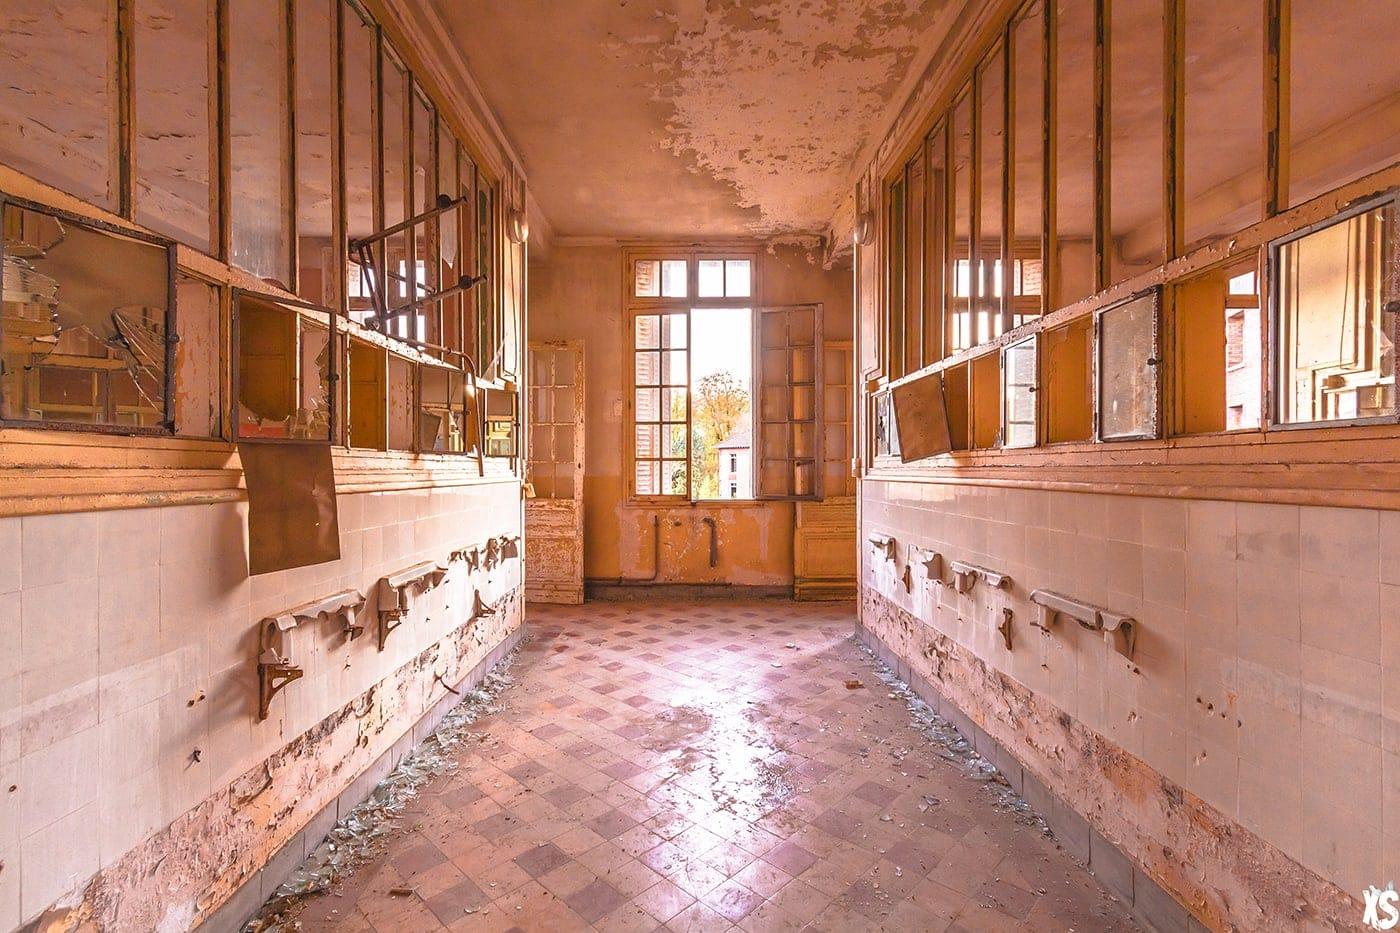 sanatorium-nestor-pirotte-36